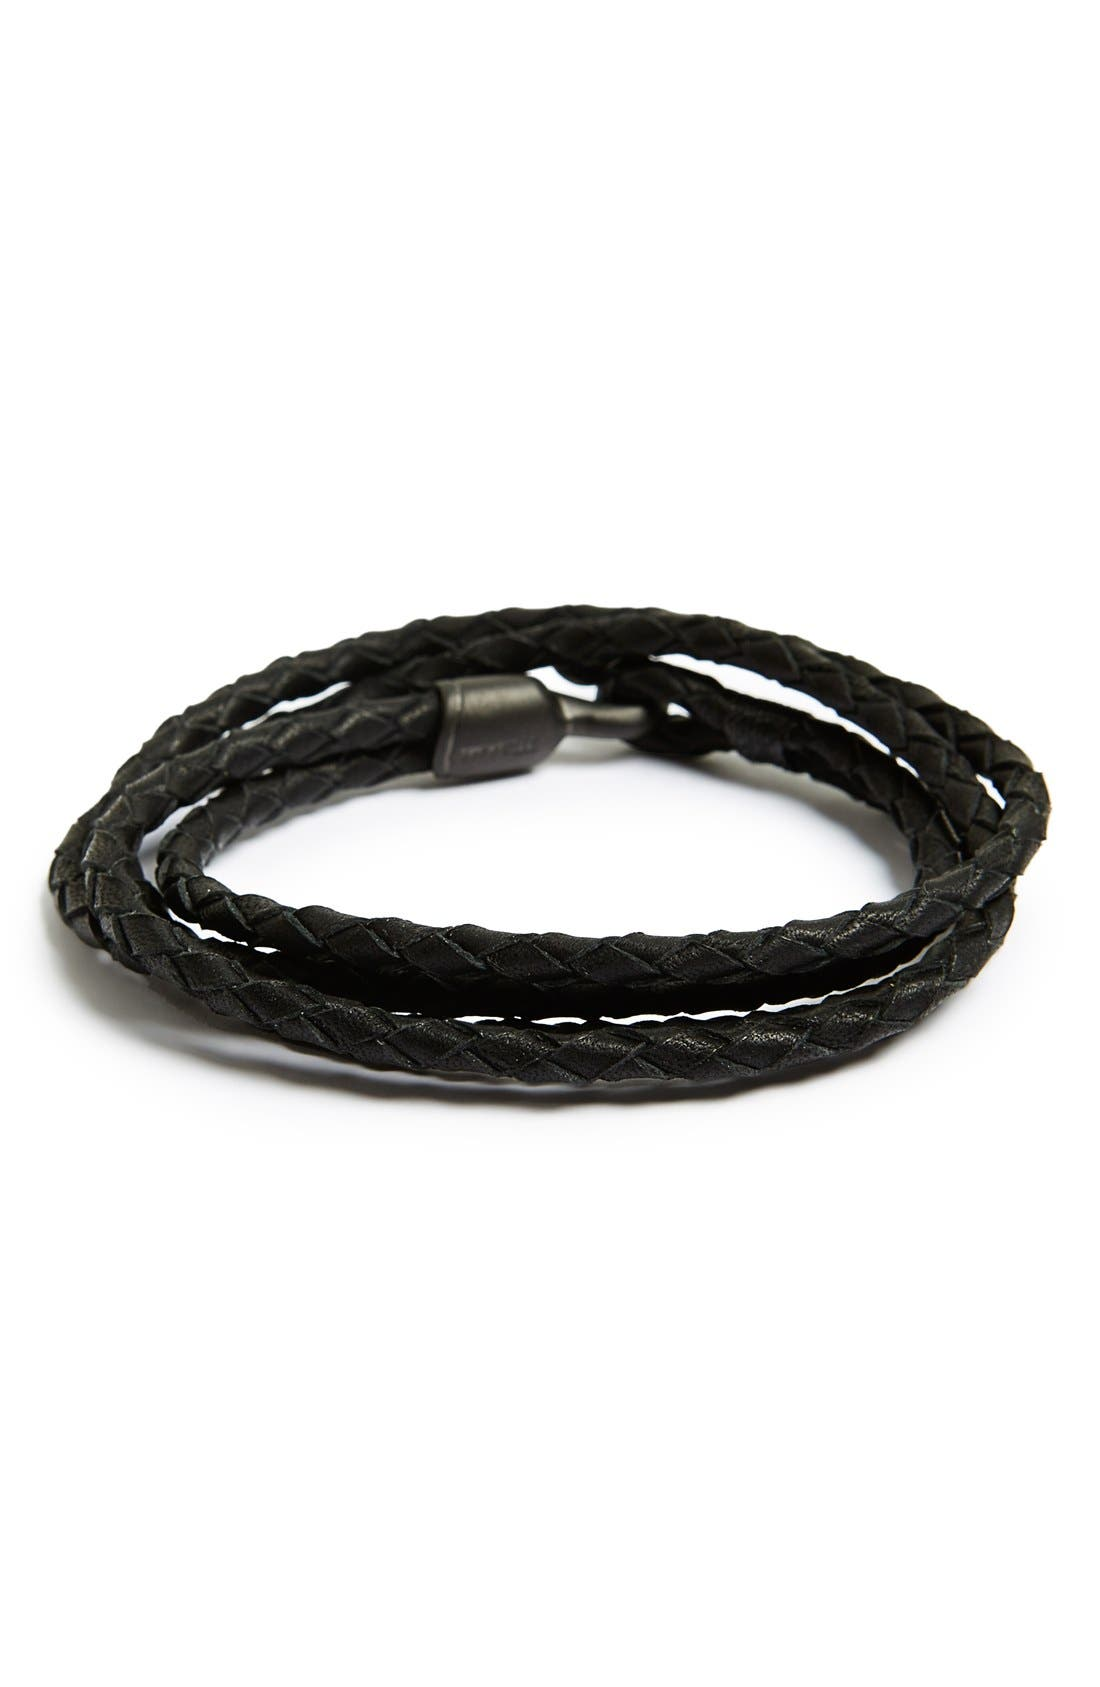 Main Image - Miansai 'Trice Noir' Braided Leather Wrap Bracelet